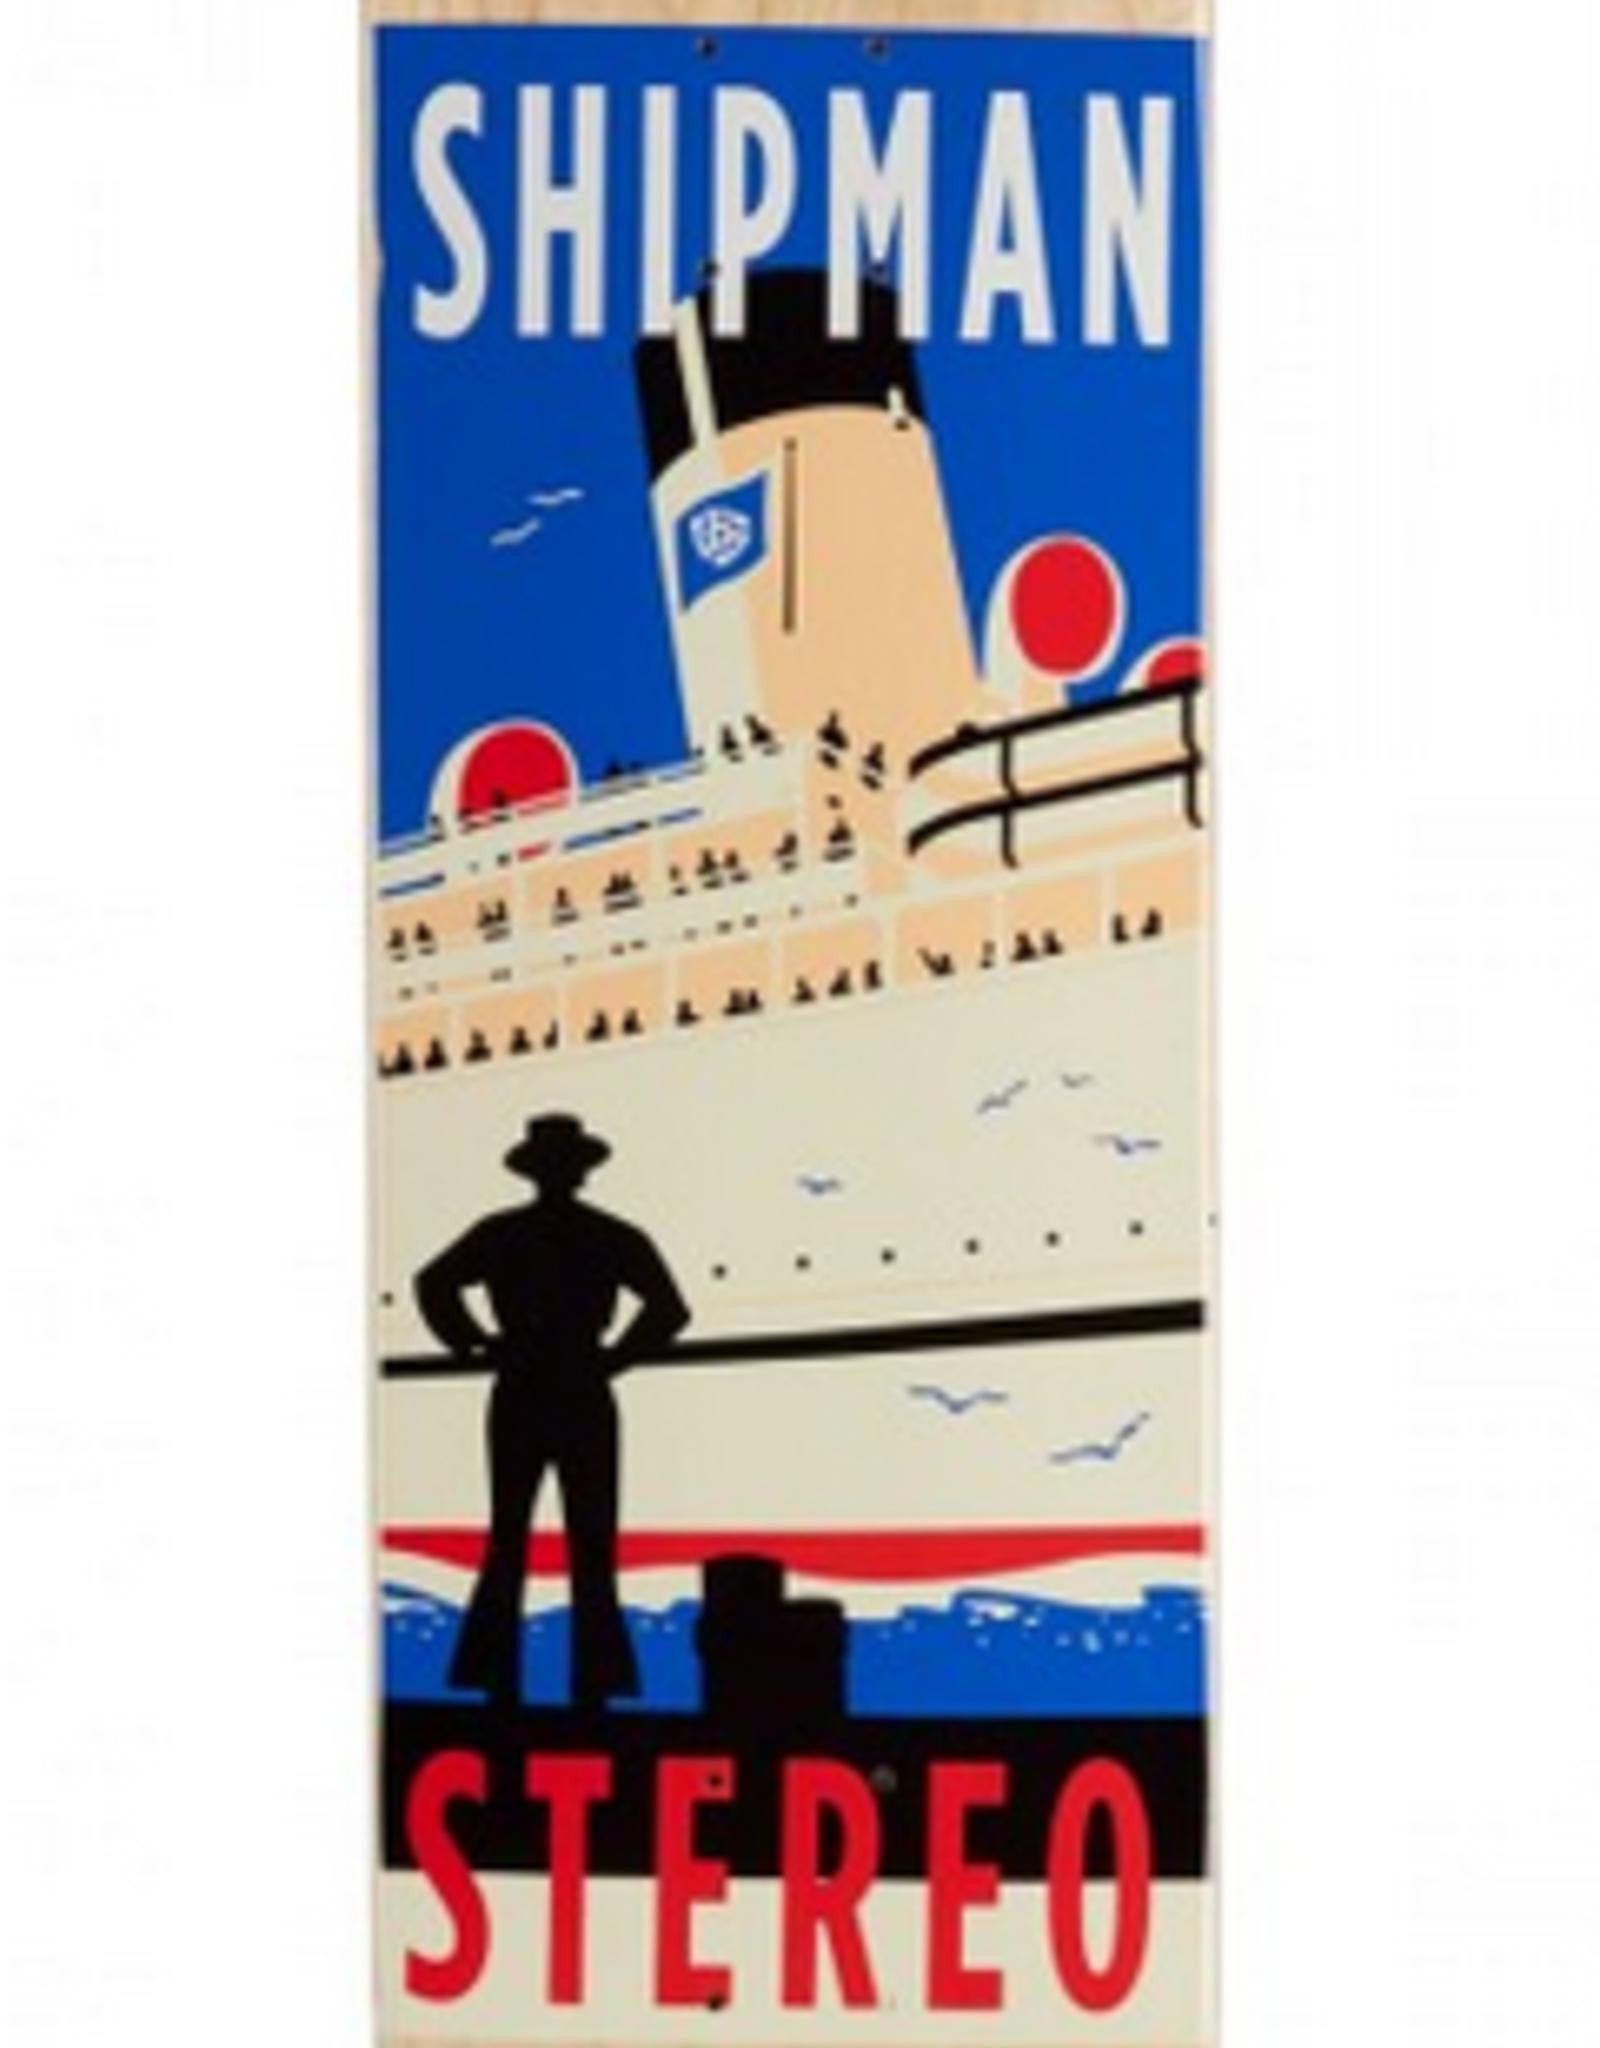 STEREO STEREO 8.25 SHIPMAN TRAVEL DECK